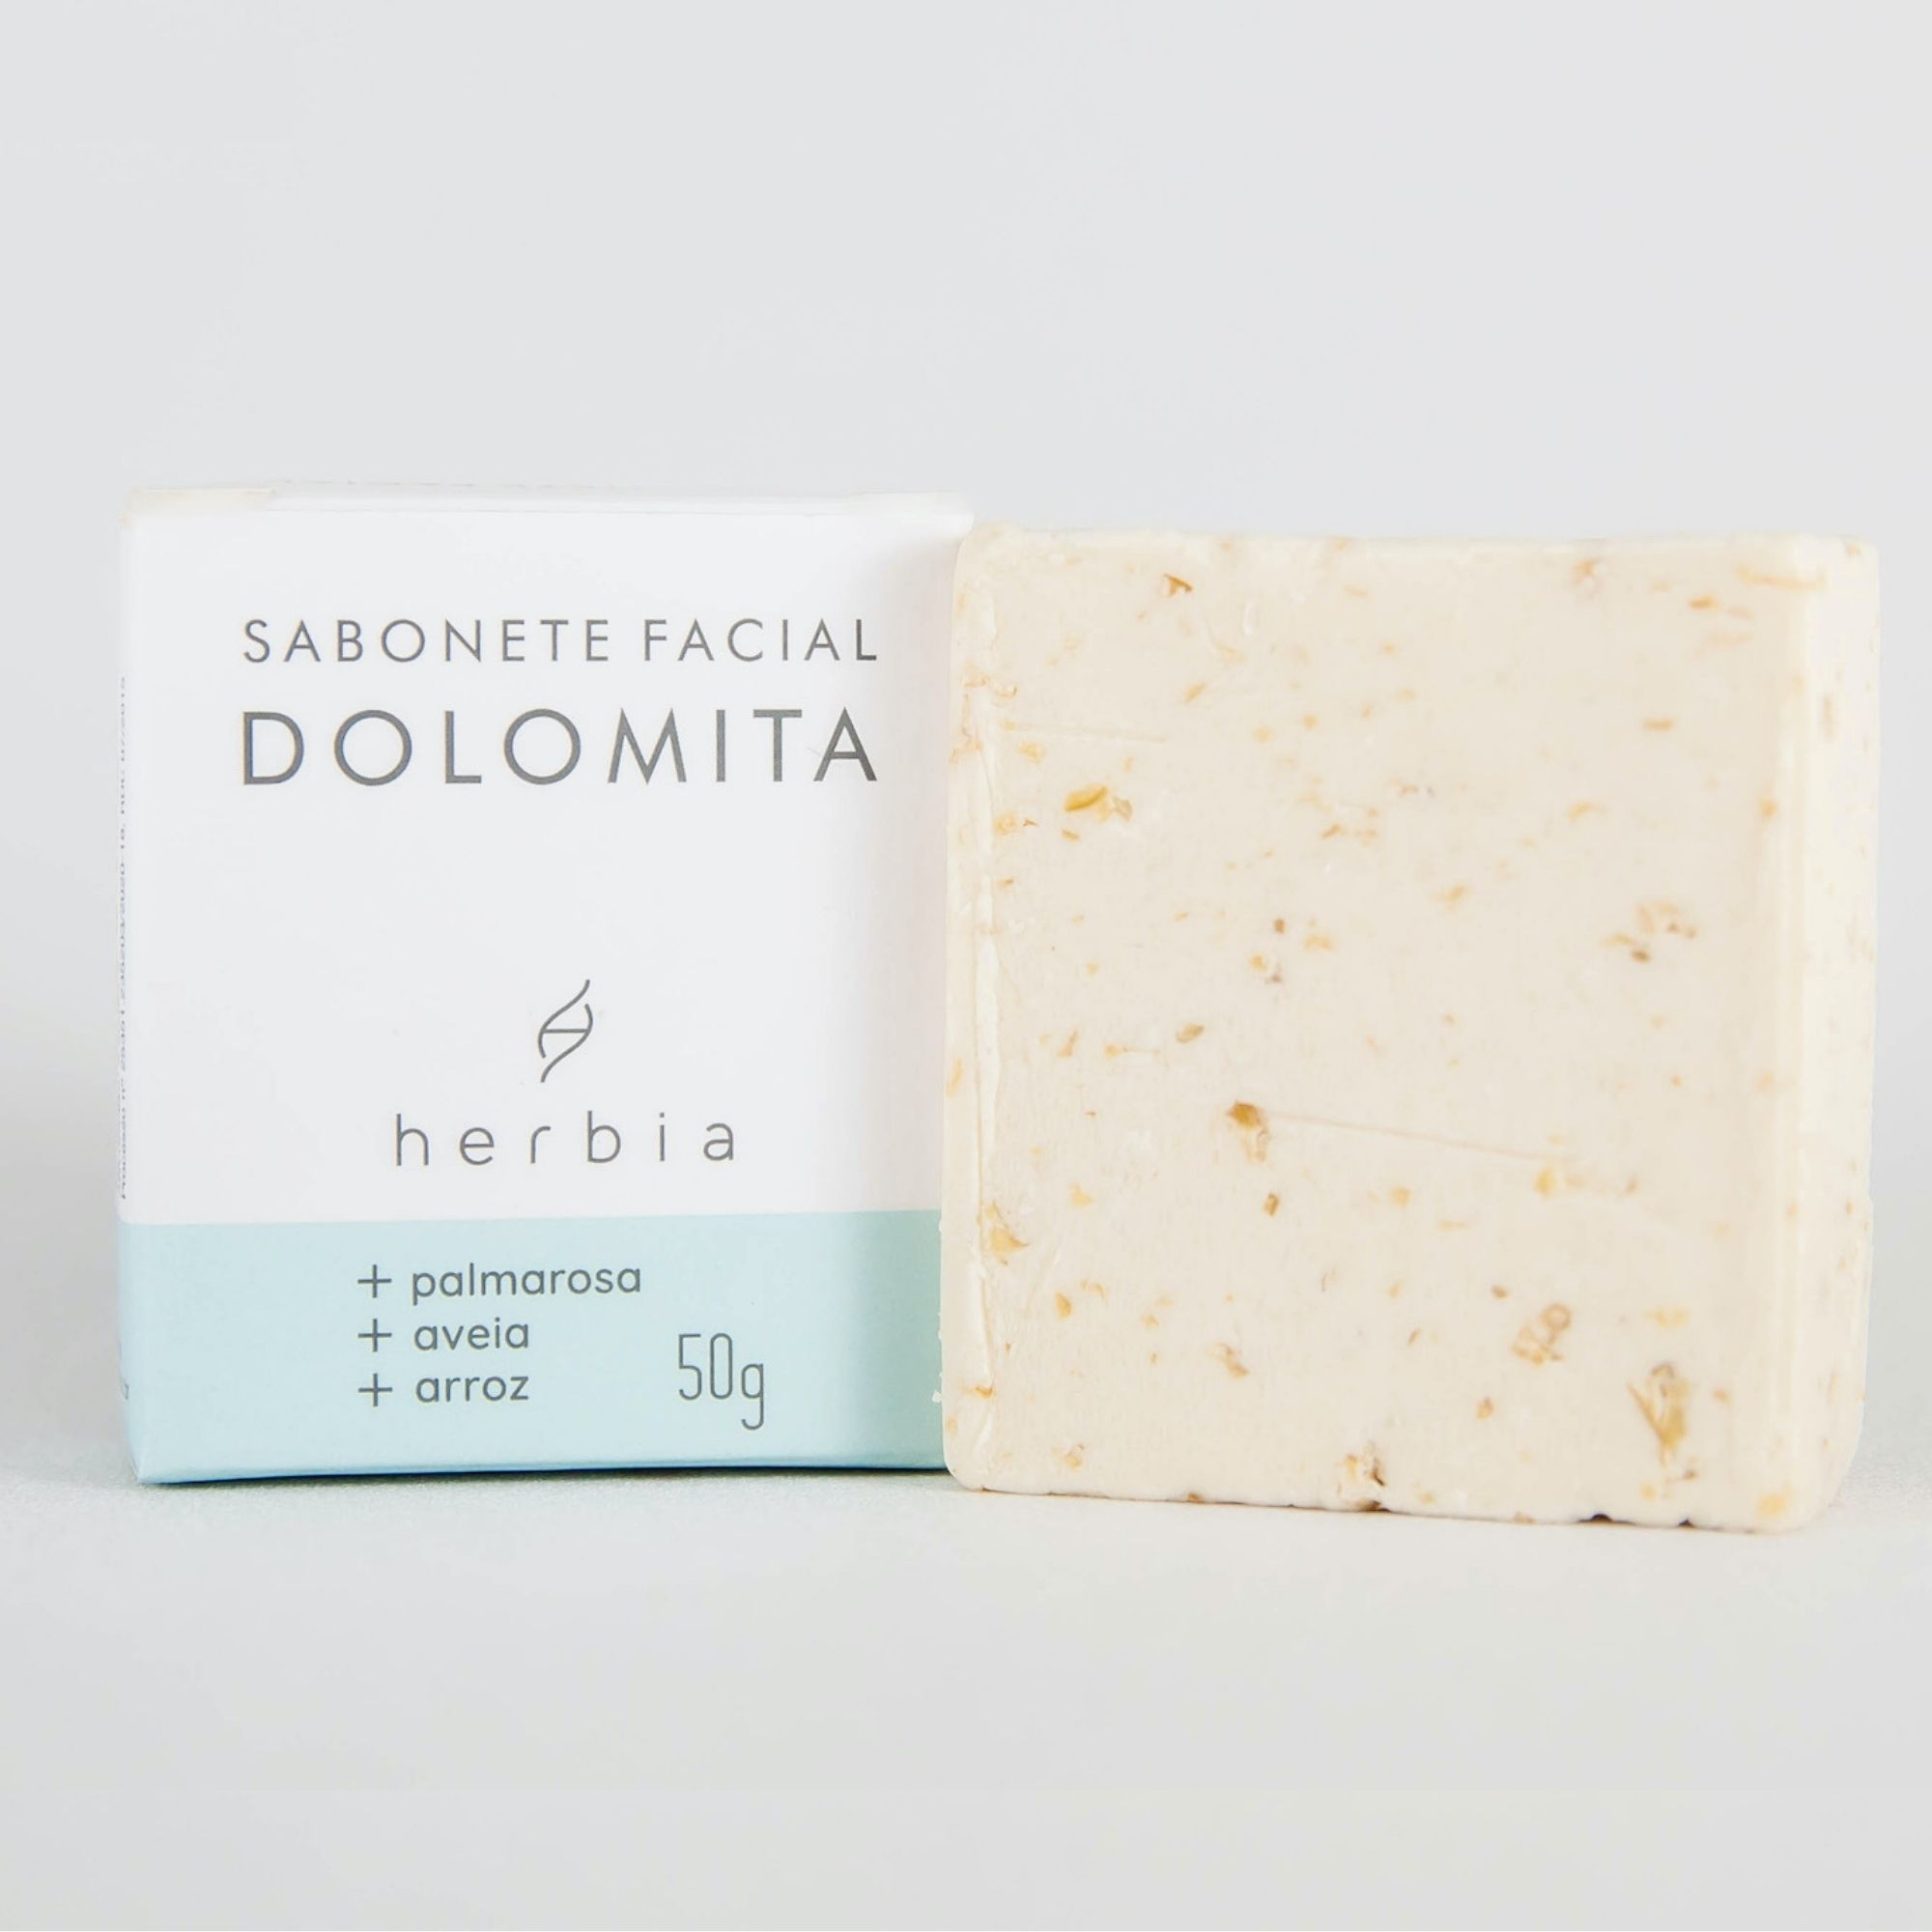 Sabonete Facial Natural e Vegano de Dolomita Herbia 50g